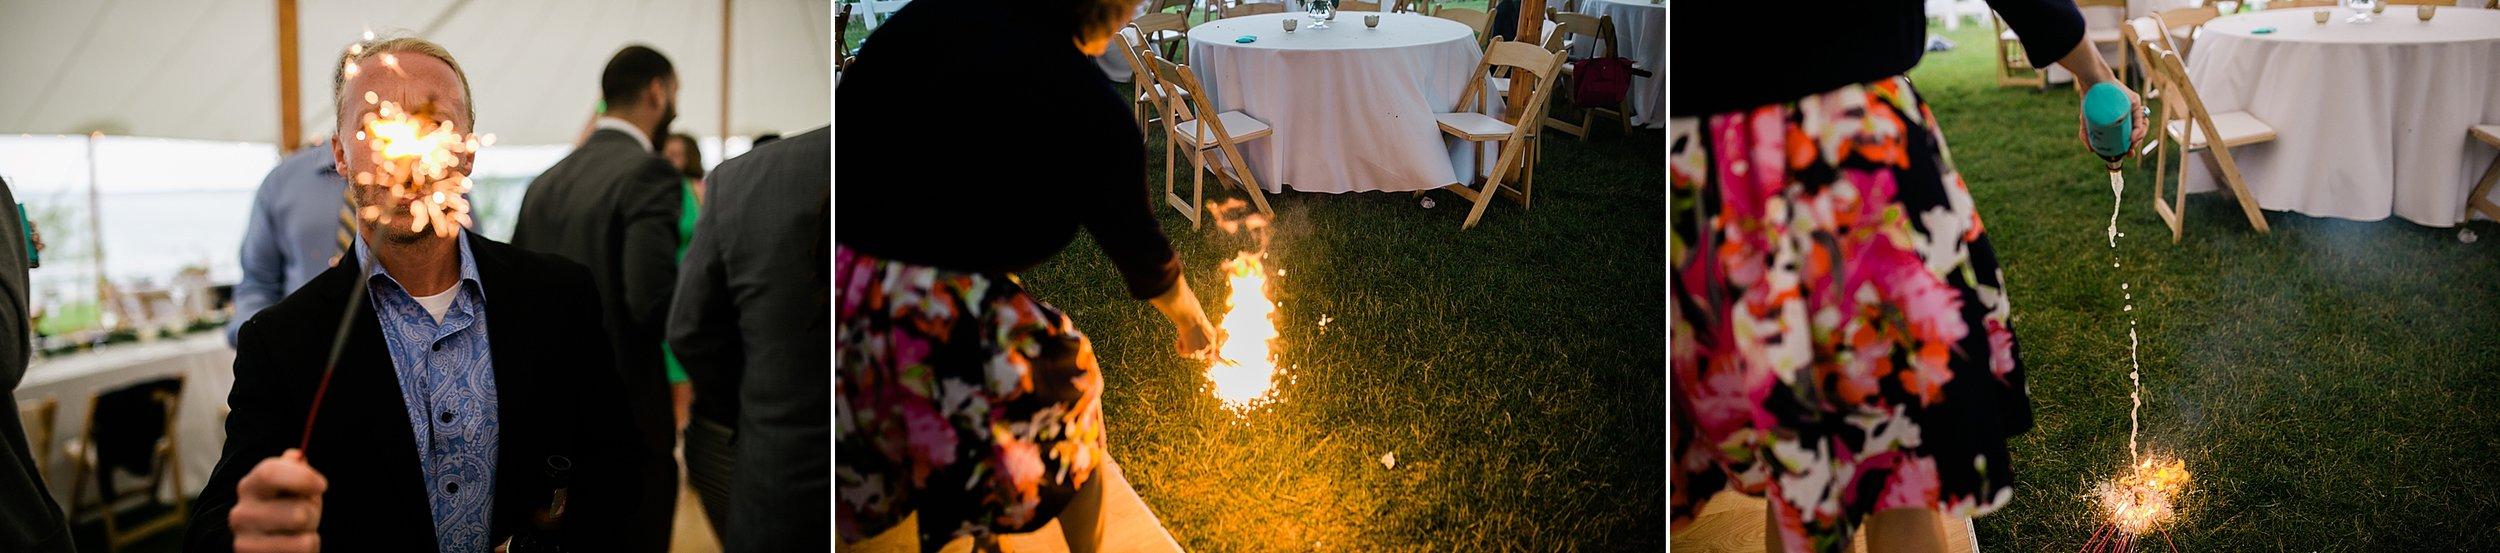 069 los angeles wedding photographer todd danforth photography cape cod.jpg